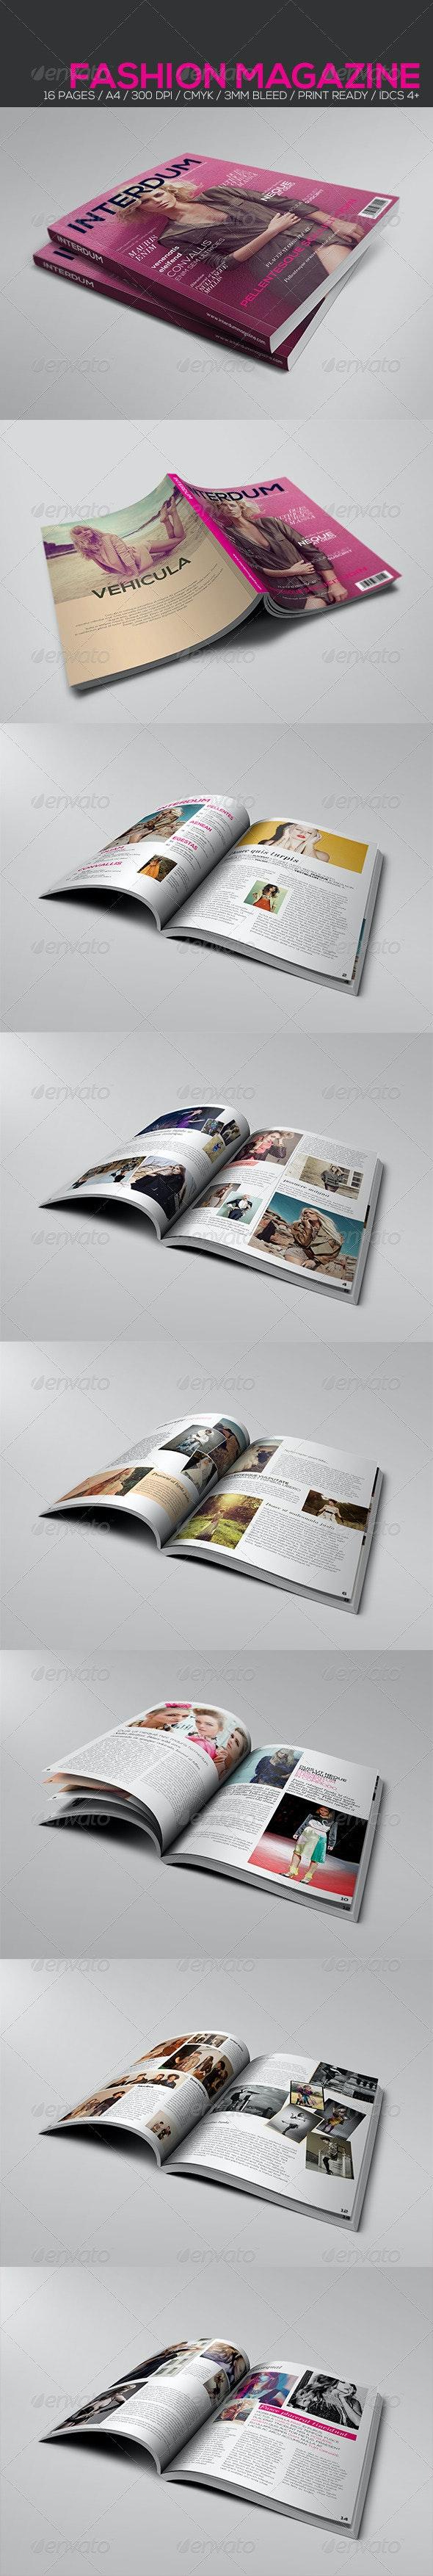 Fashion Magazine Template - Magazines Print Templates